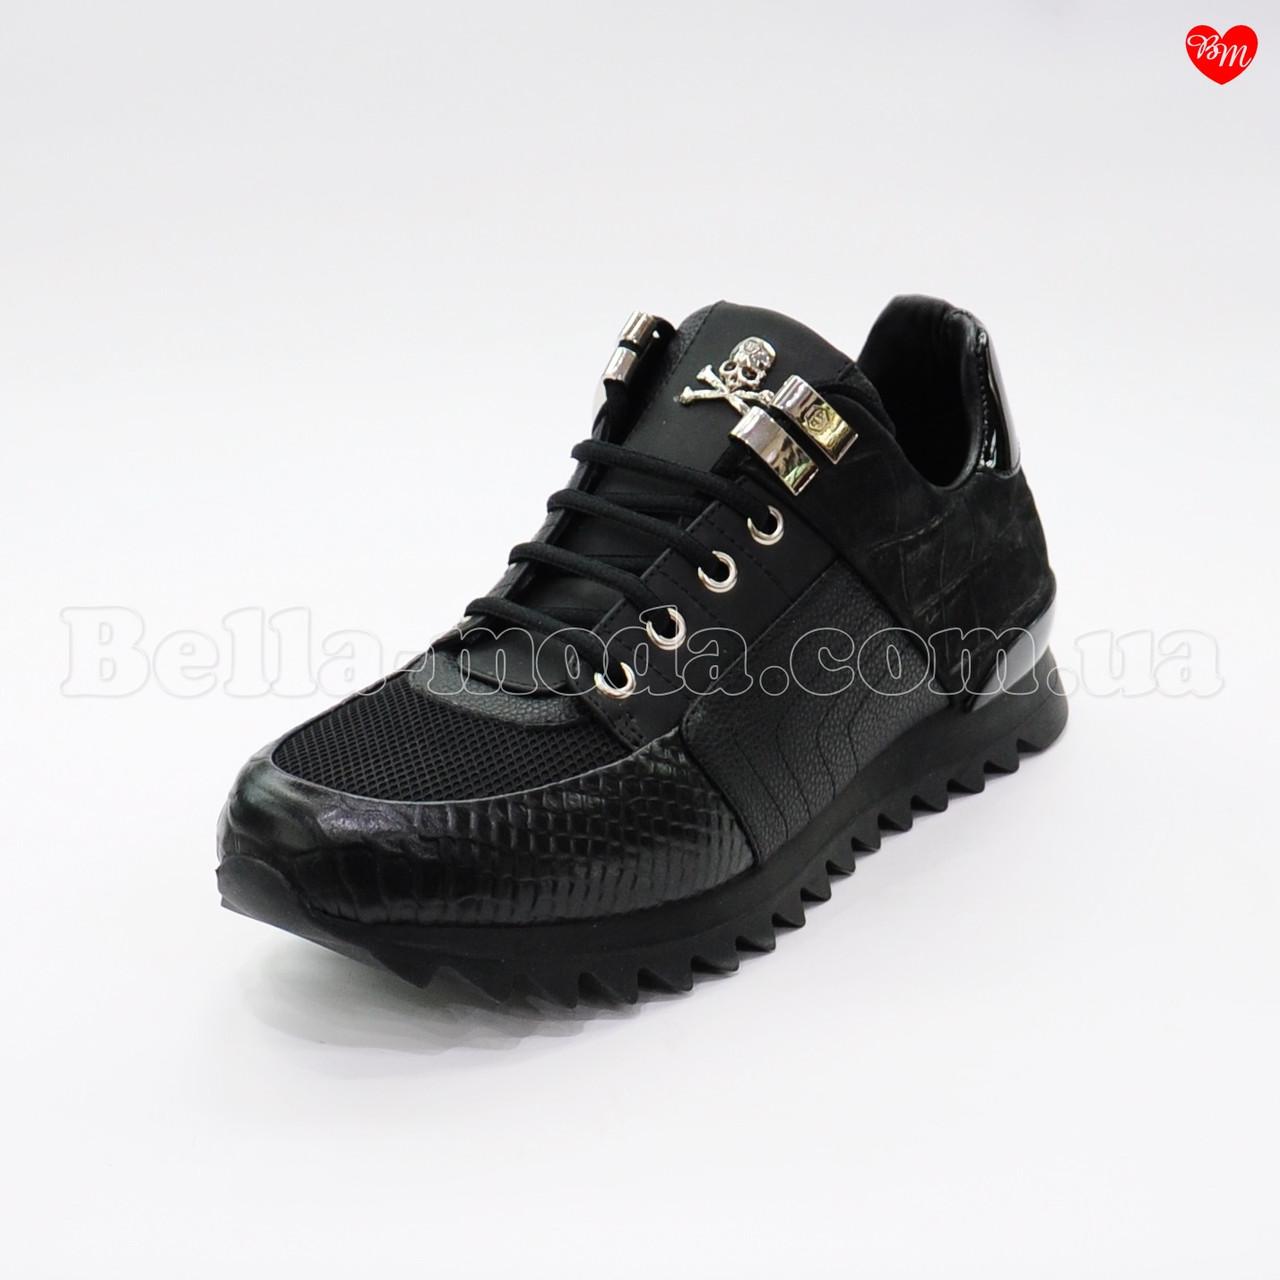 5bc12744ff7c3 Мужские кроссовки с черепом Philipp Plein - интернет-магазин